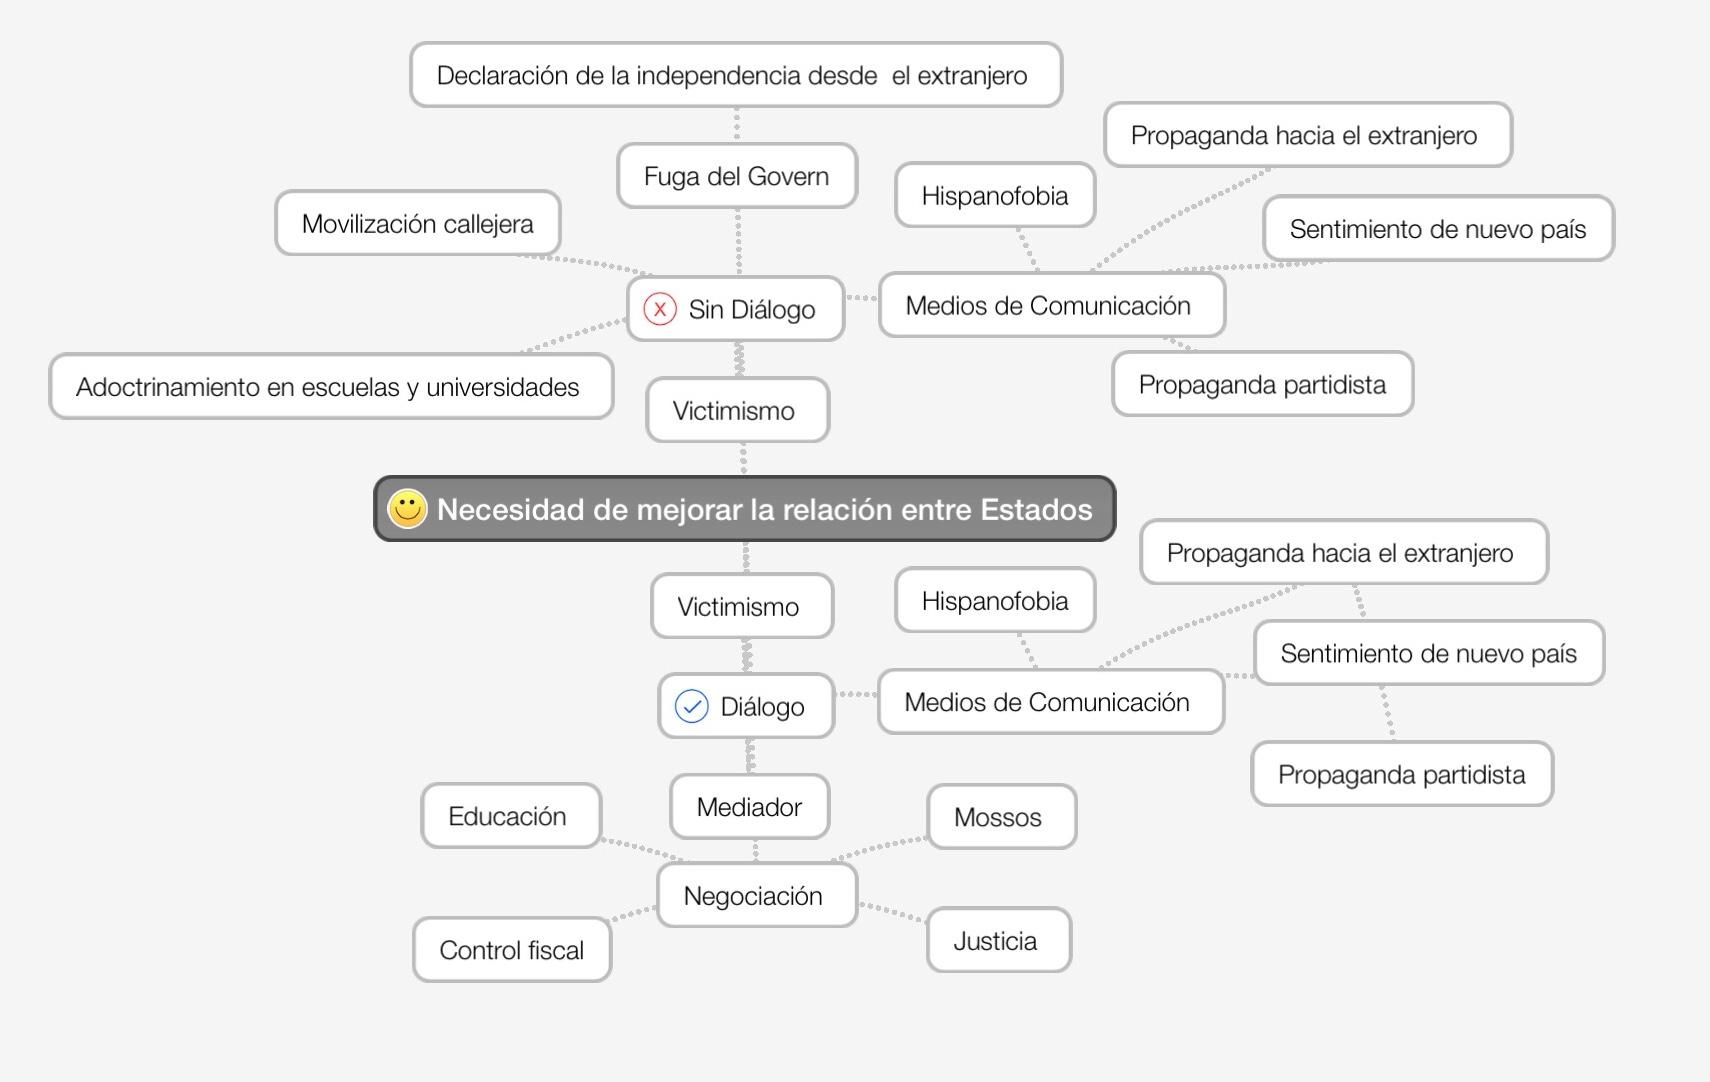 Las variables que maneja Carles Puigdemont